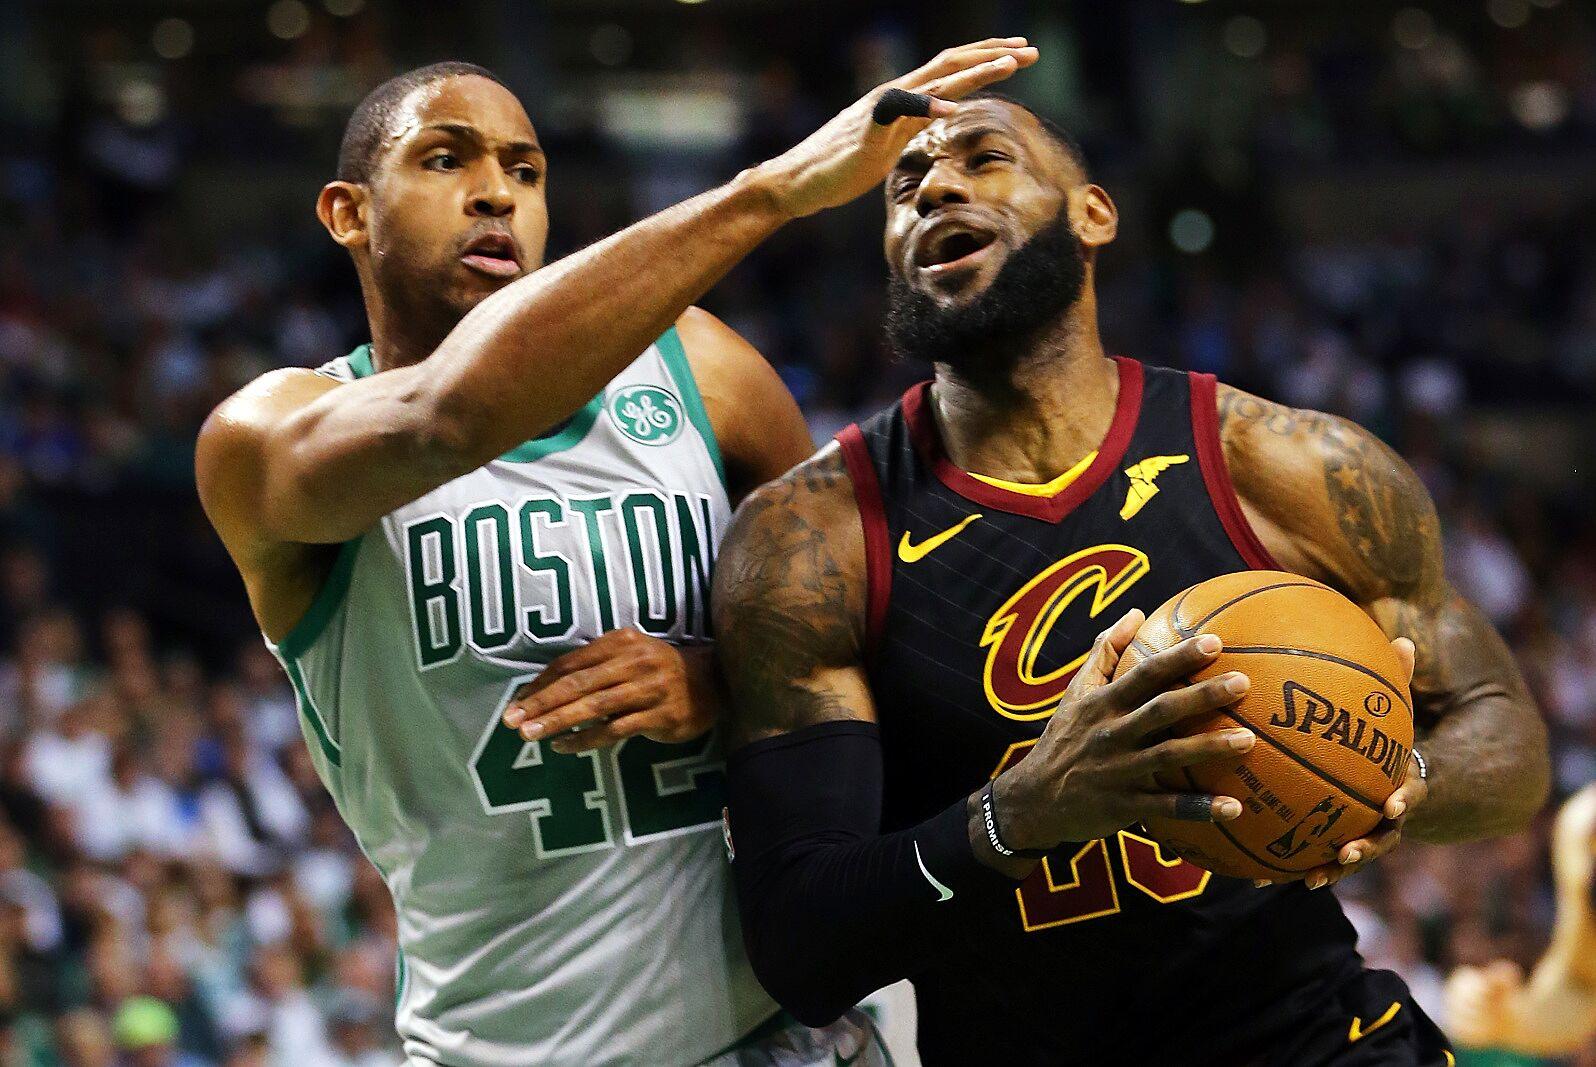 Boston Celtics: 5 Options to try against LeBron James